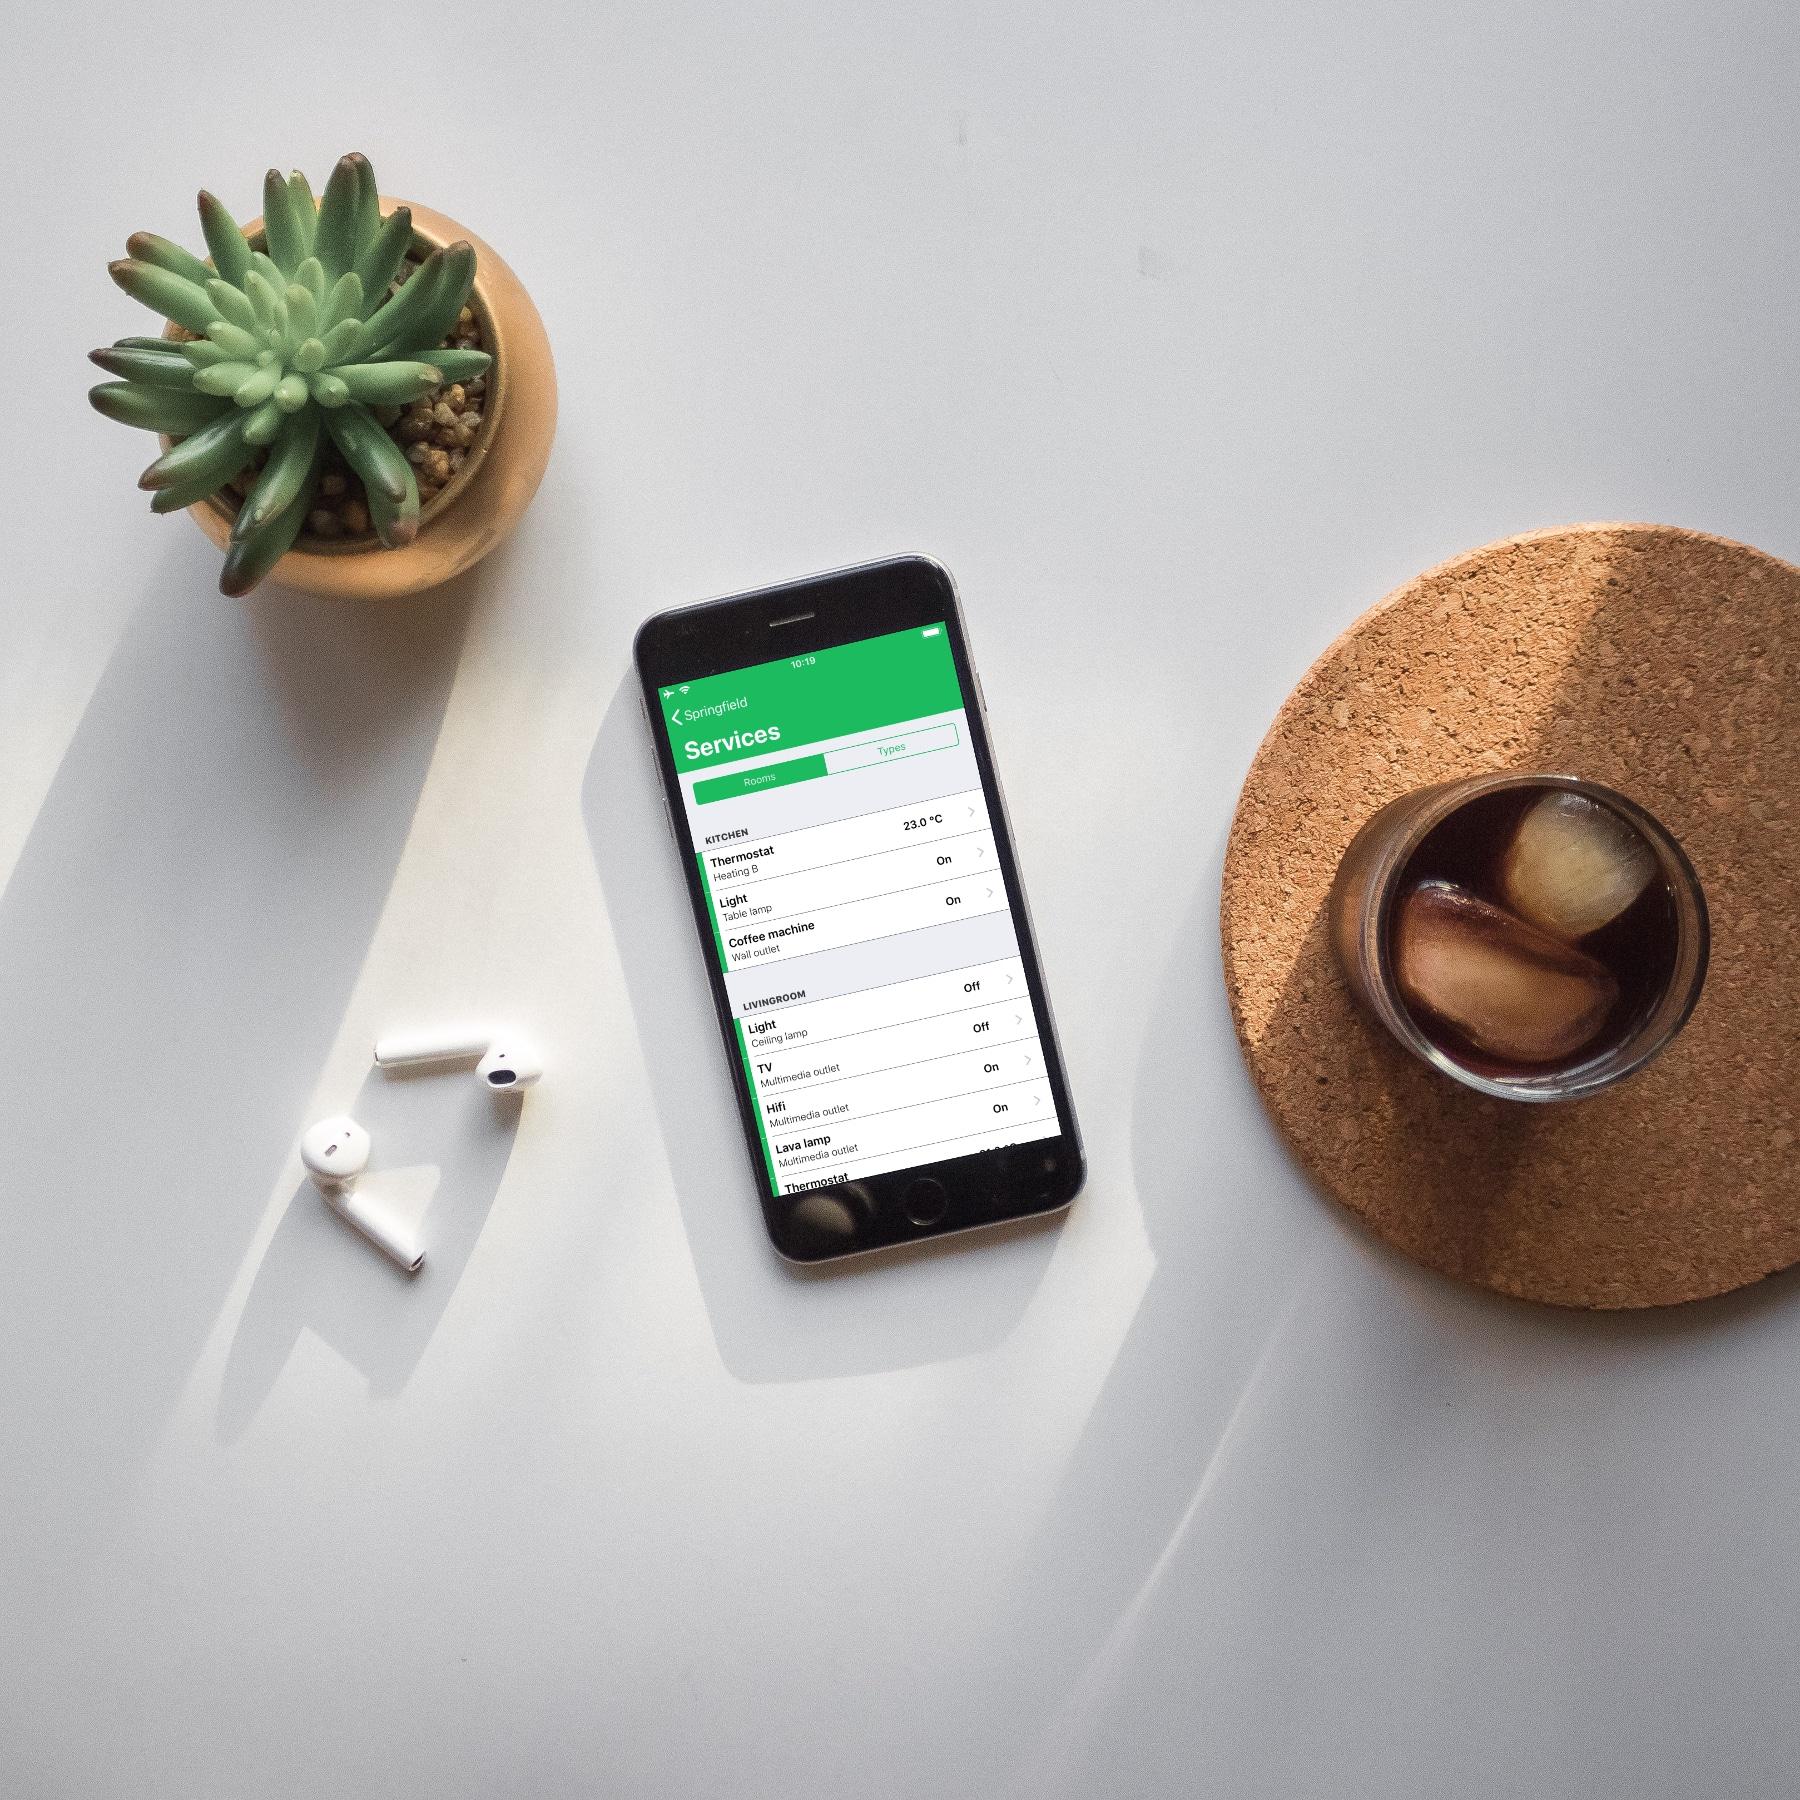 Controller für HomeKit: Großes Update für HomeKit App